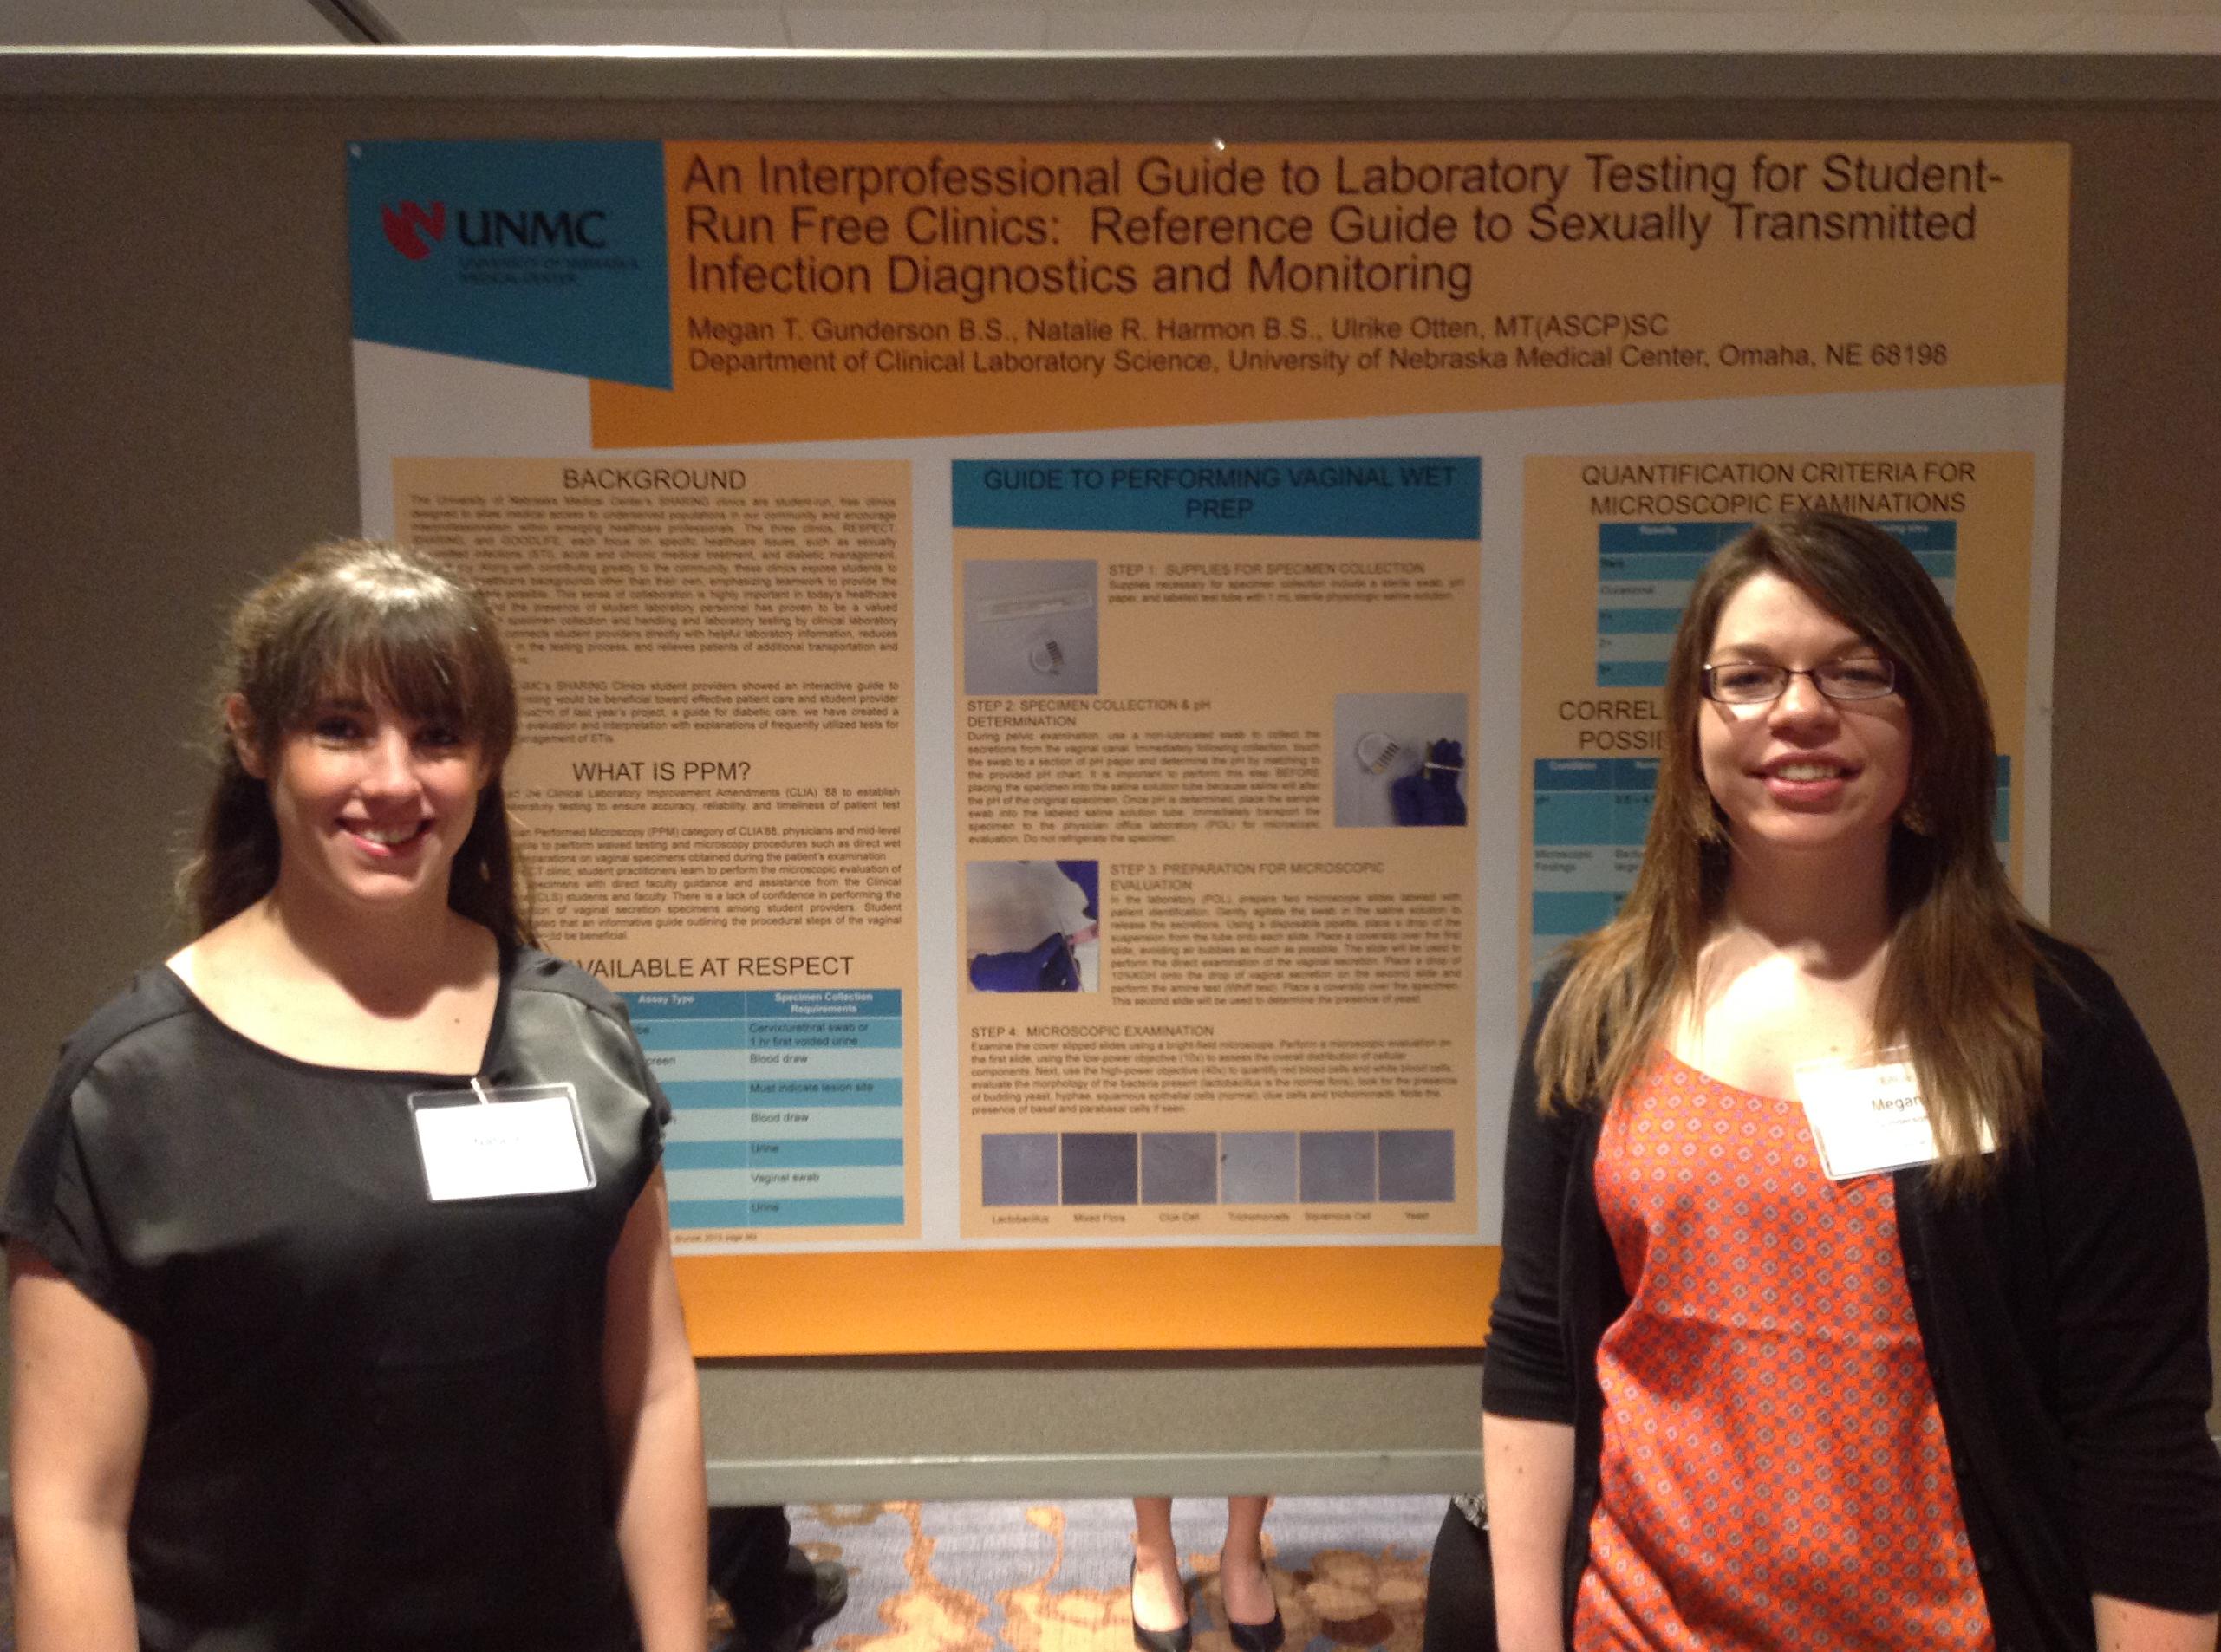 Megan Gunderson Natalie Harmon presenting their poster in Atlanta.